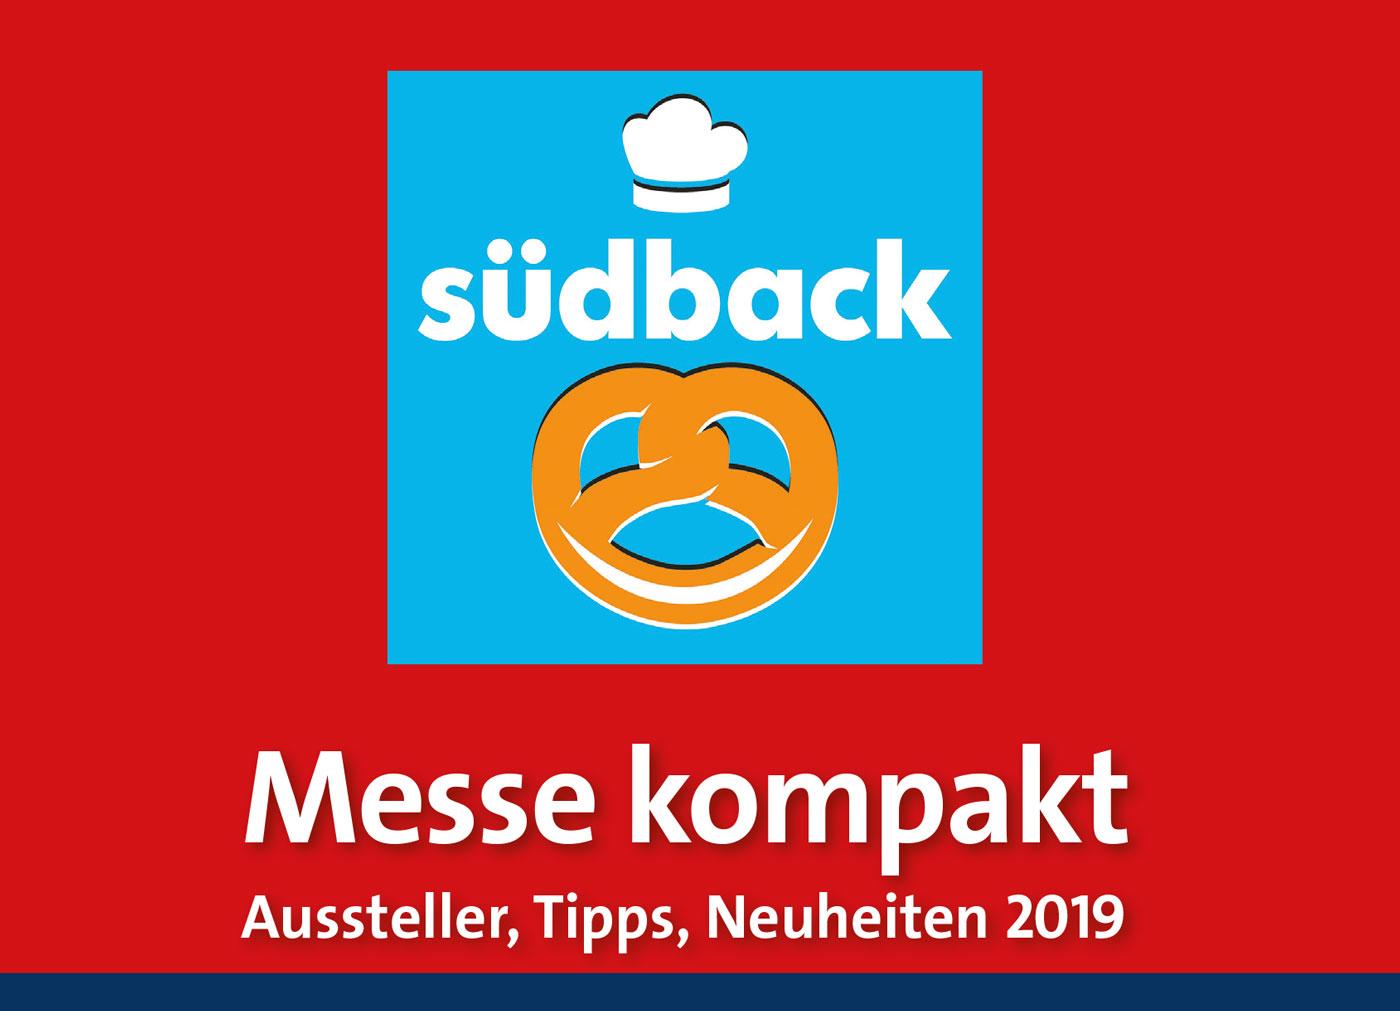 Südback BesucherBooklet 2019